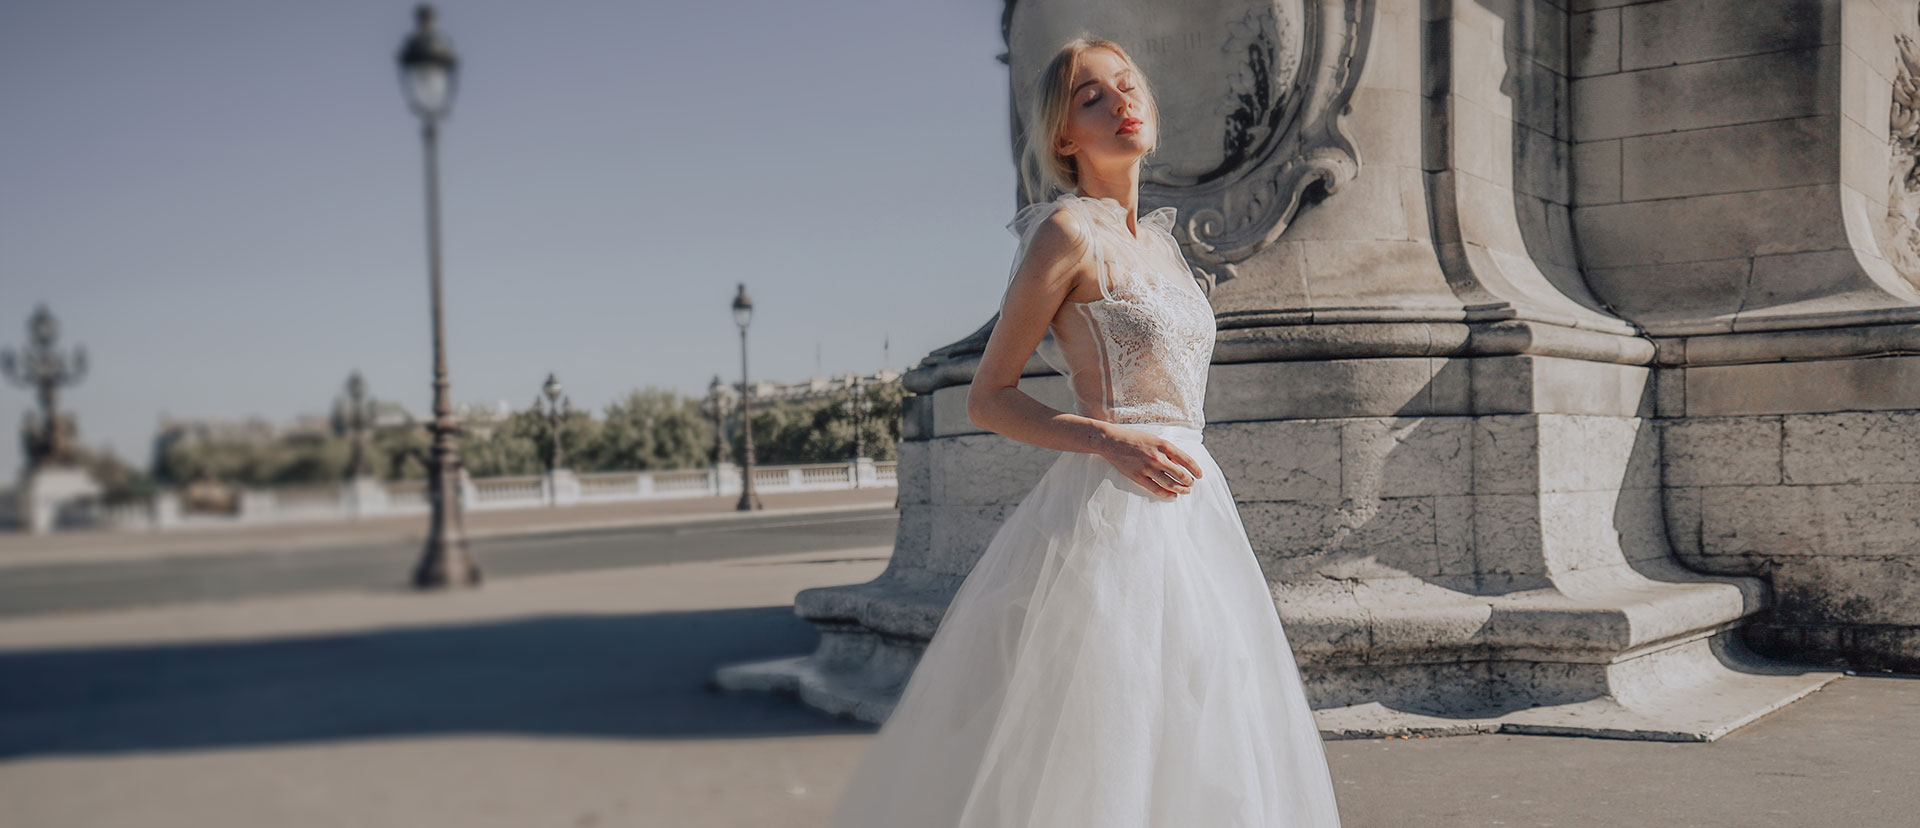 Cocomelody Wedding Dresses Bridesmaid Dresses More,Wedding Dresses Rental Nyc